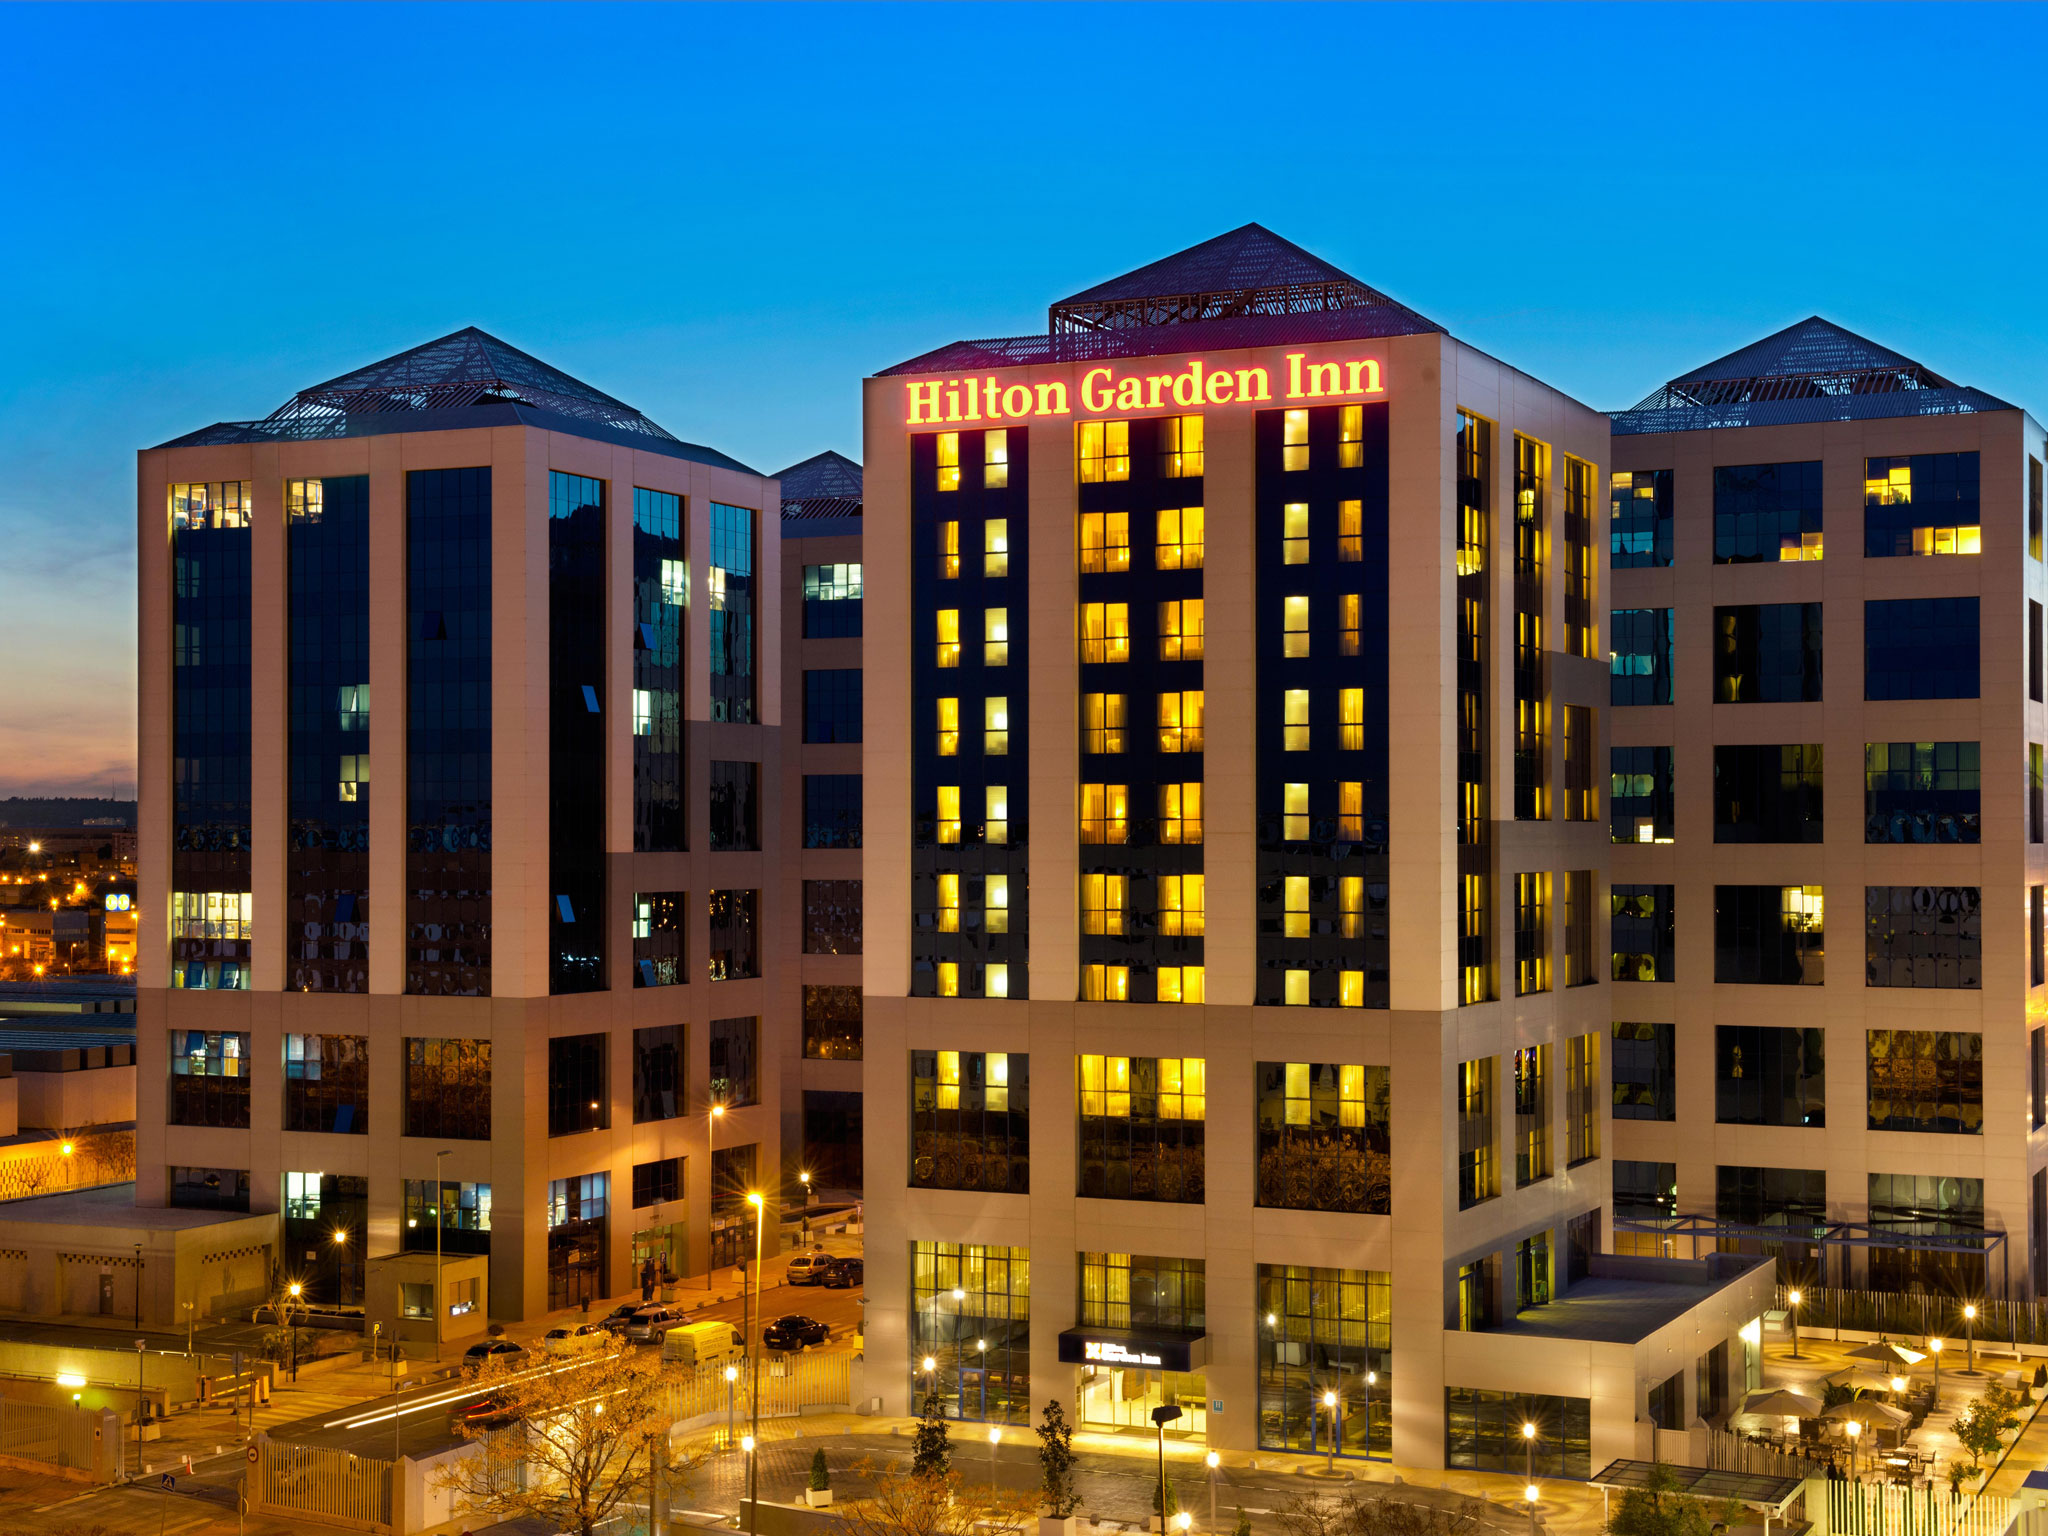 Hoteles en espa a barcelona madrid mallorca hilton for Hotel calle sevilla madrid